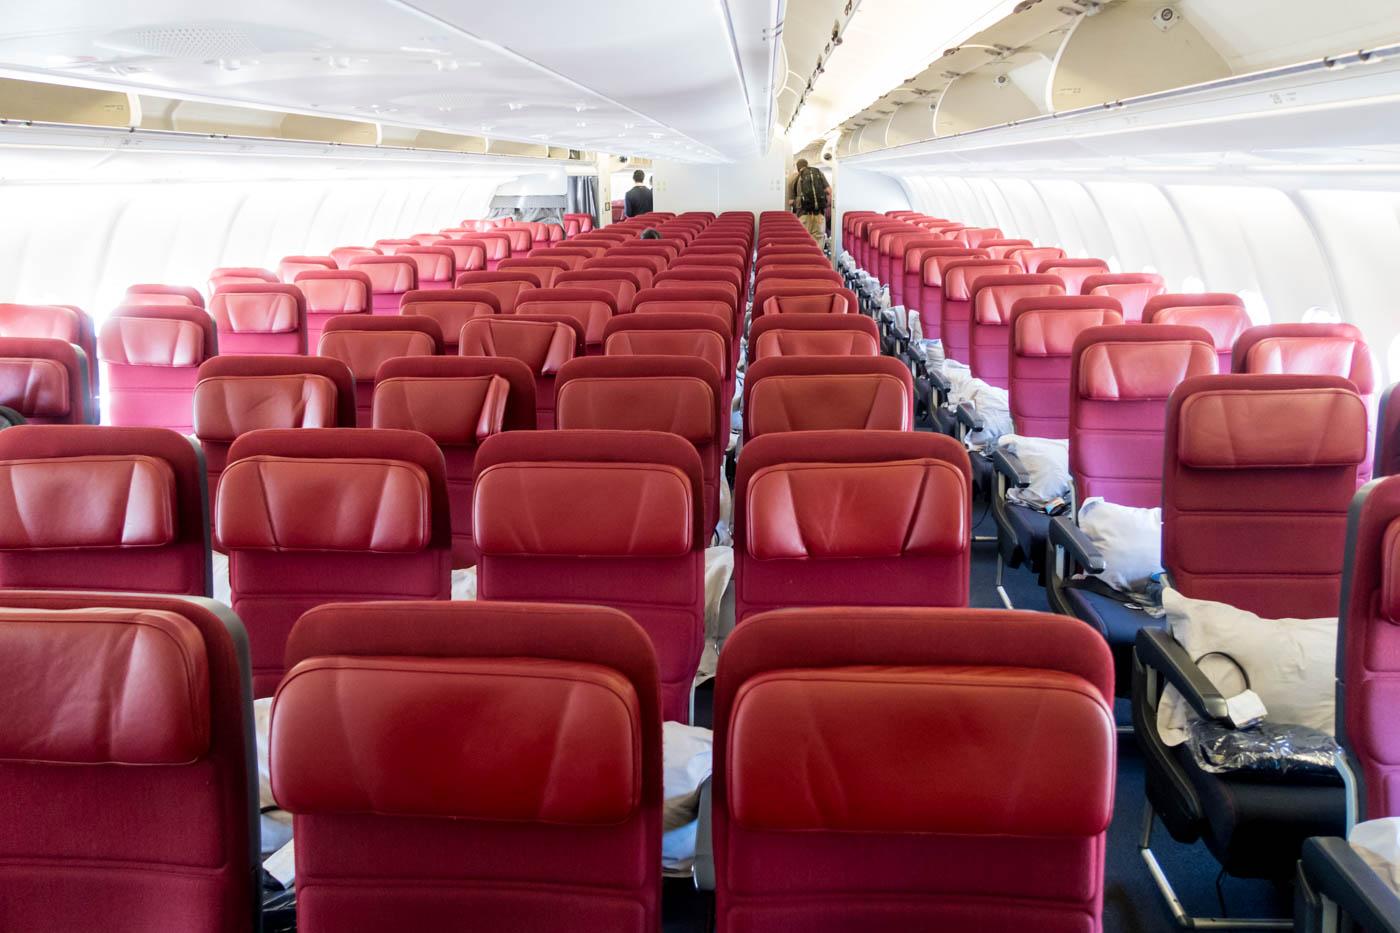 Qantas Airbus A330-300 Economy Class Cabin